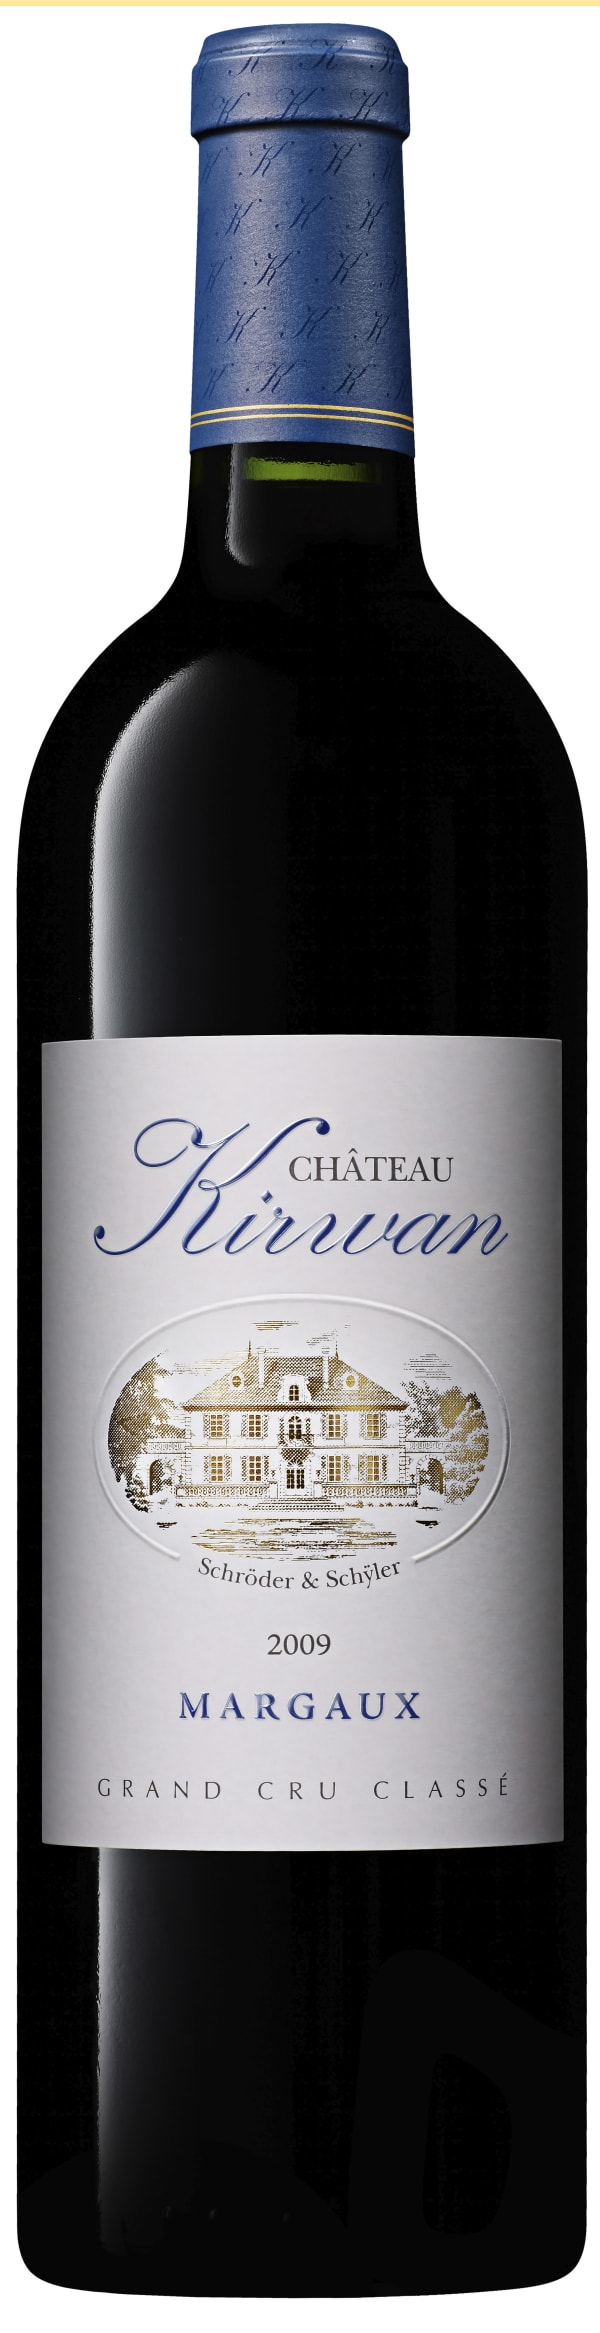 Château Kirwan Grand Cru 2009